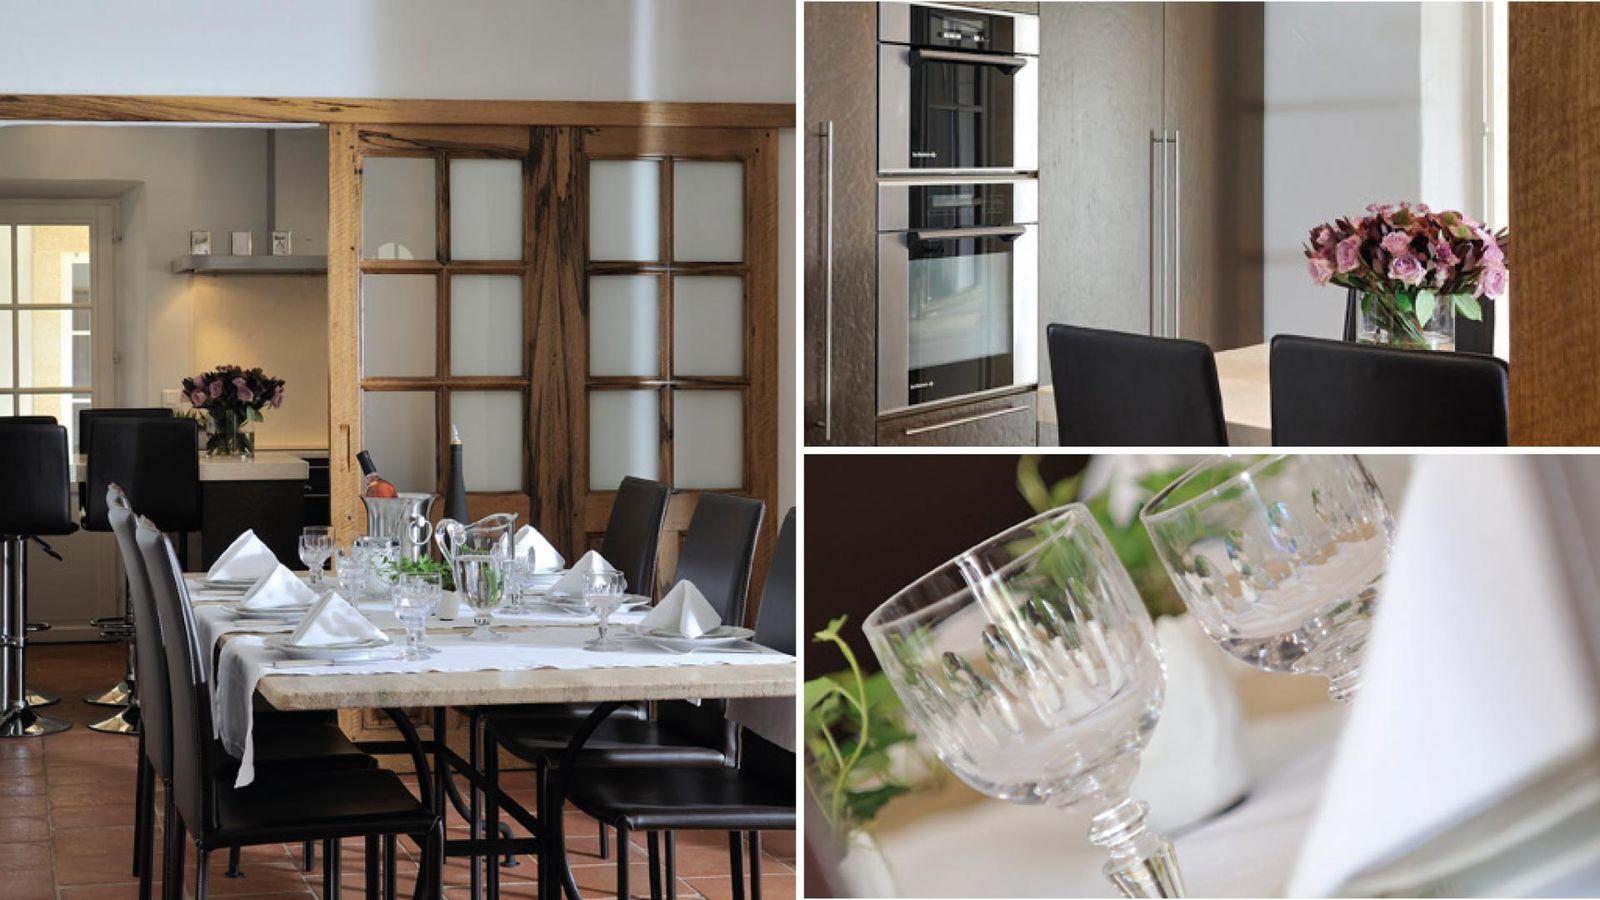 Outstanding villa Rental in Saint Remy de Provence 14